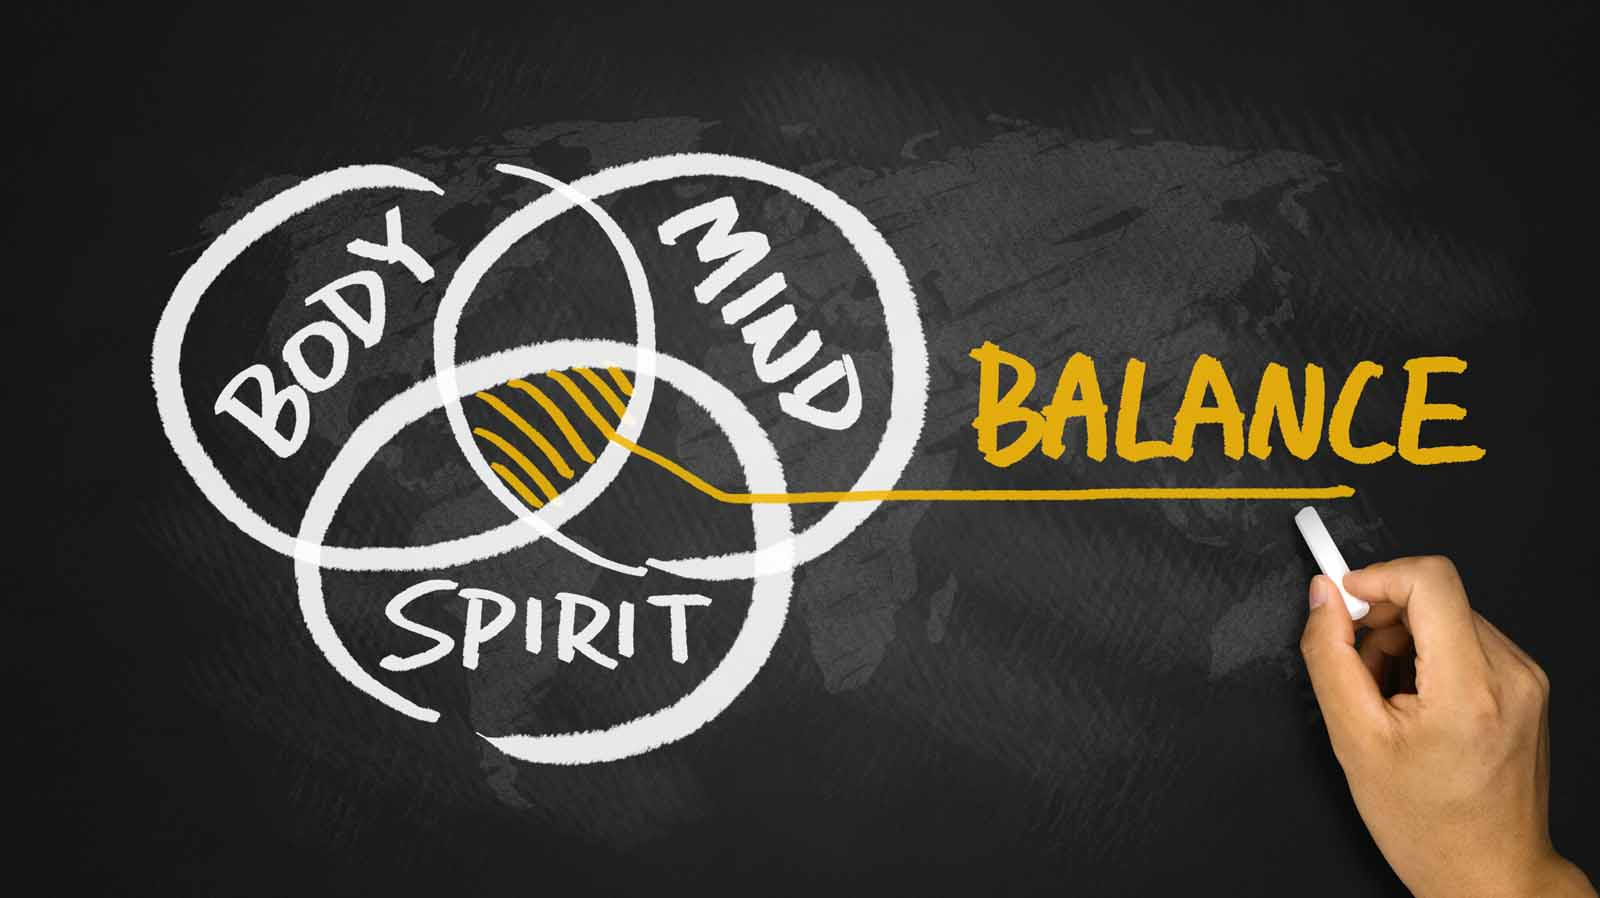 mind, body, spirit balance written on a blackboard